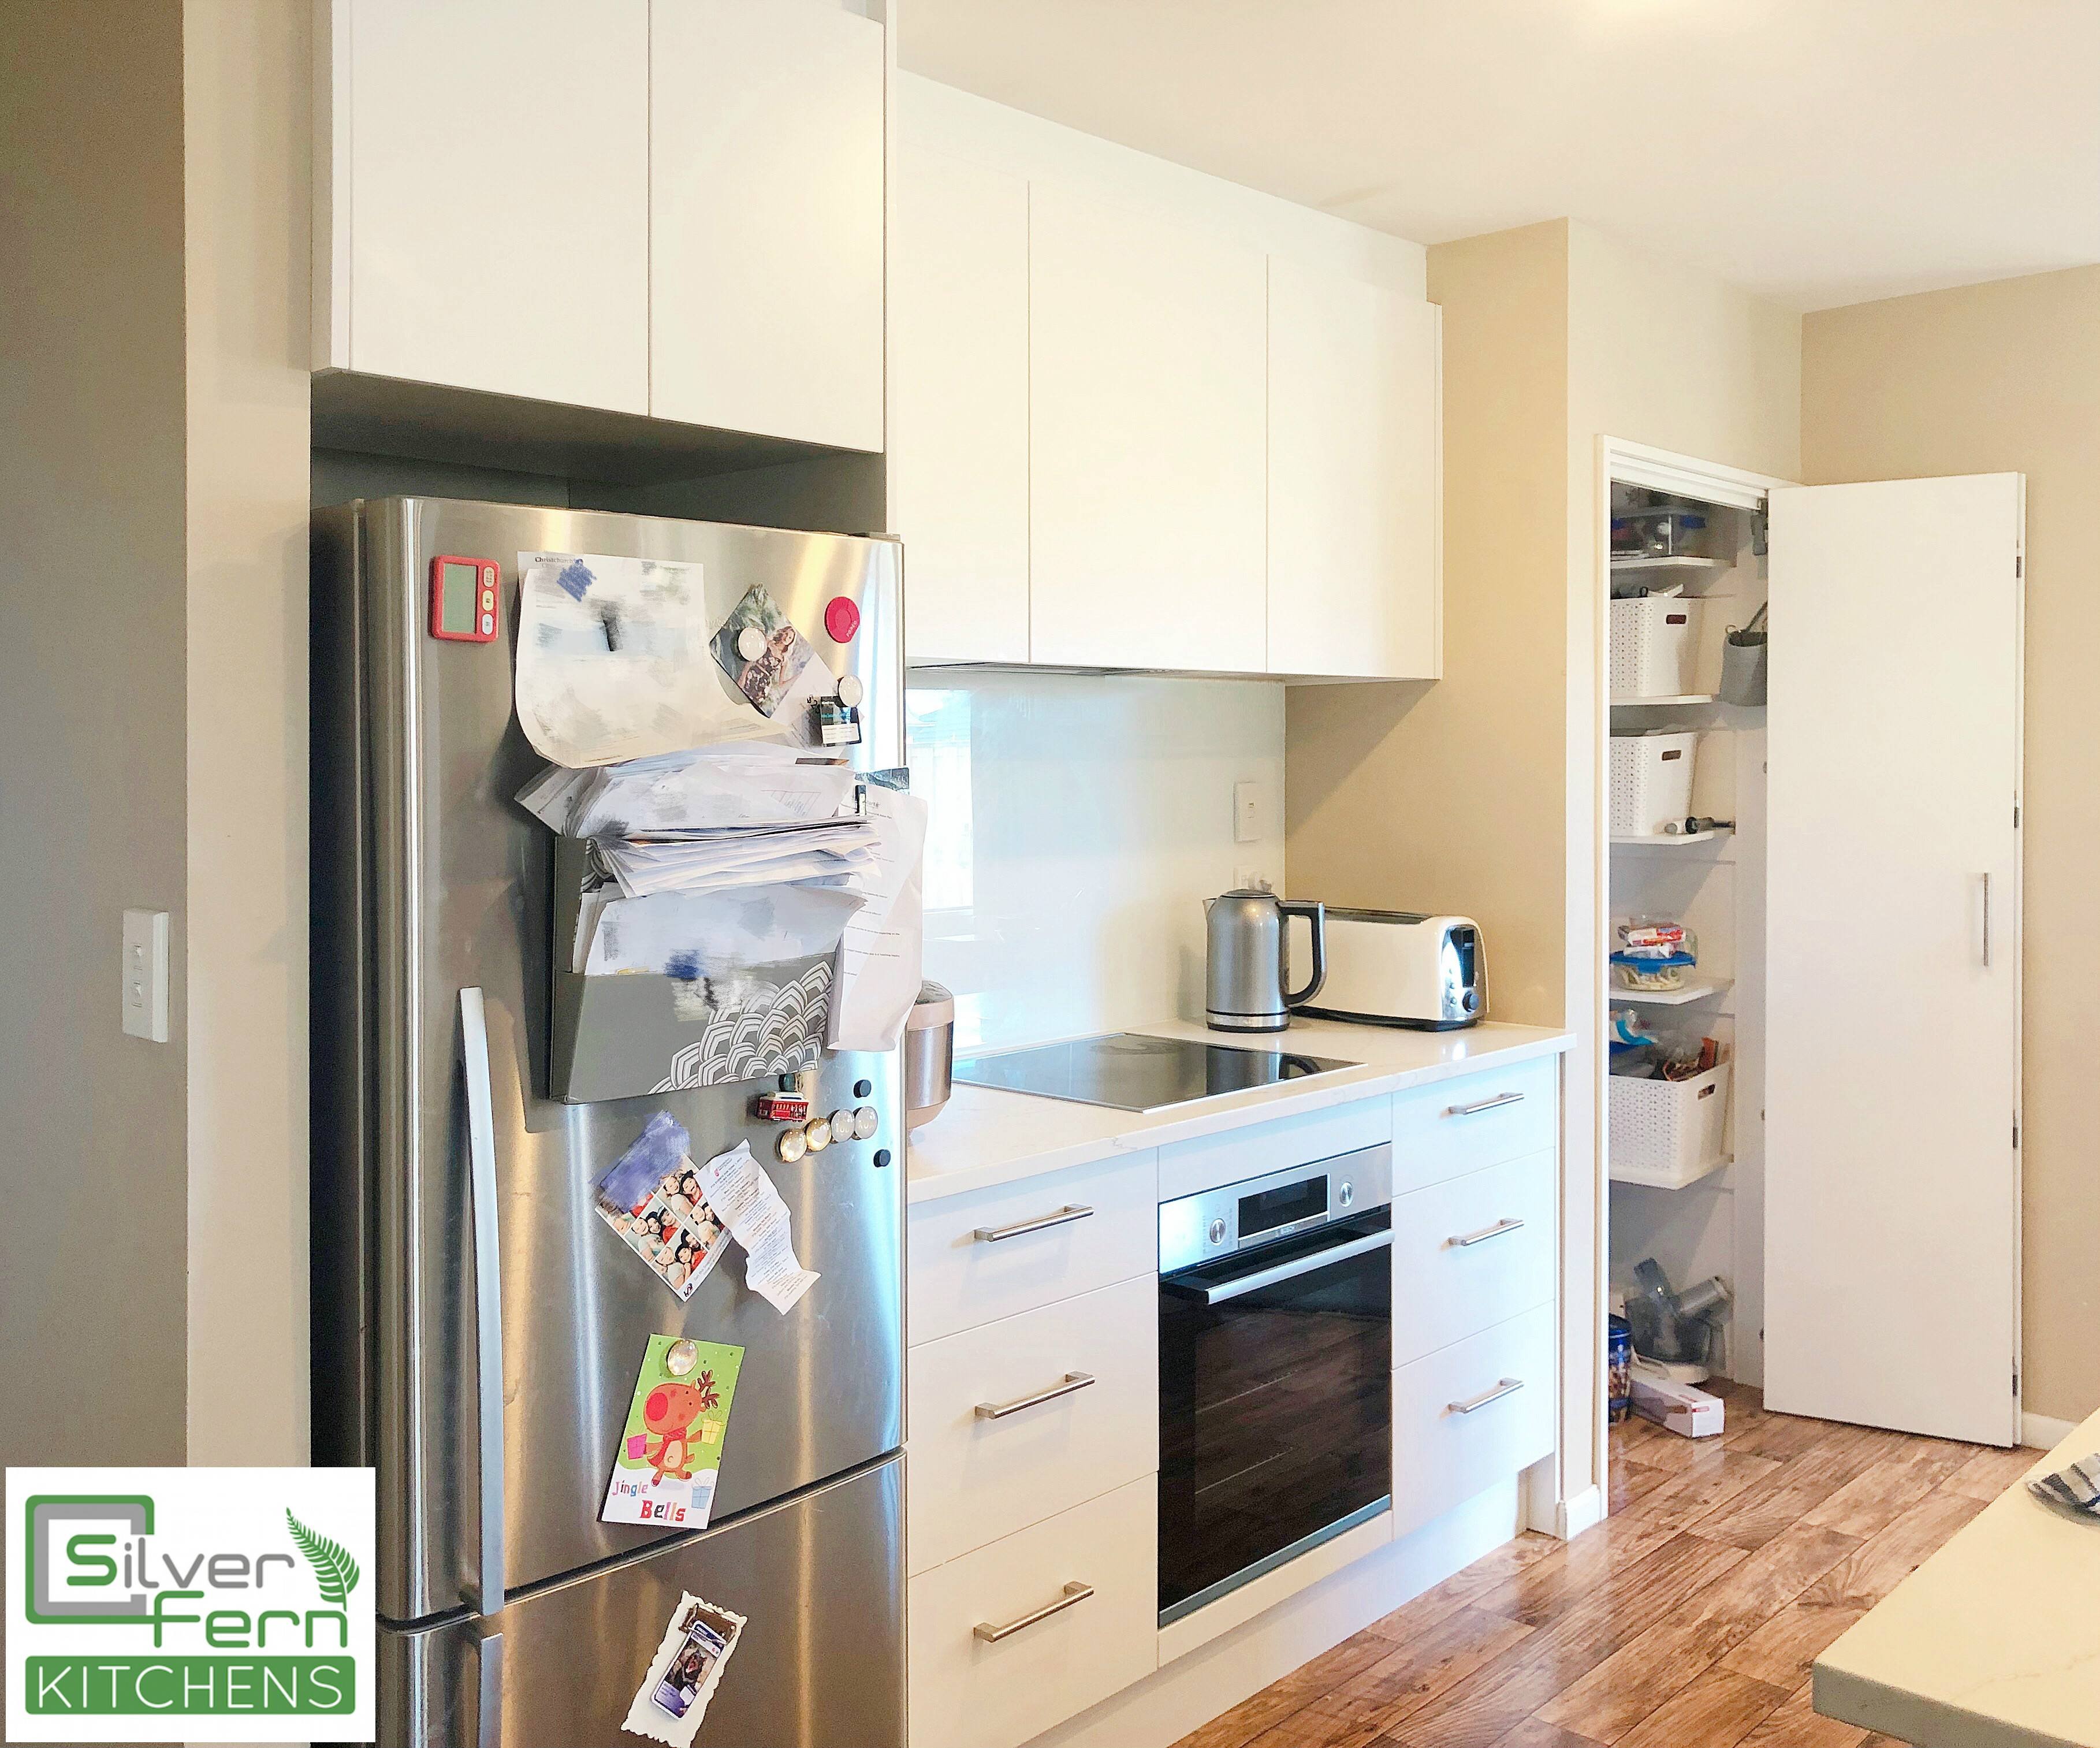 Kitchen Remodel in Northwood